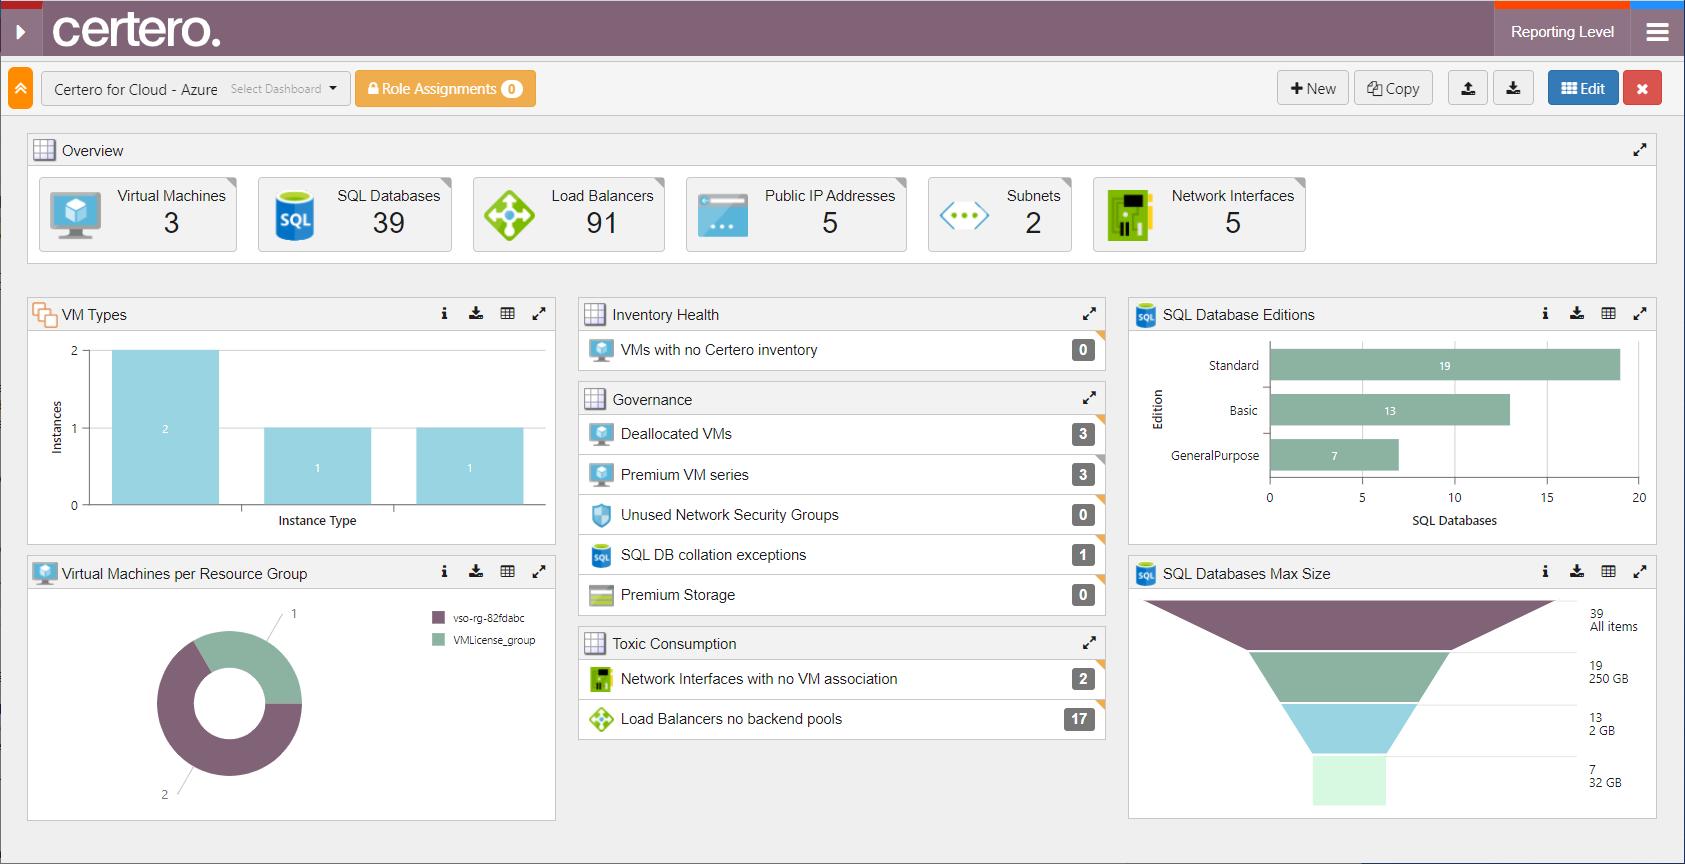 Certero for Cloud screenshot: Azure Dashboard